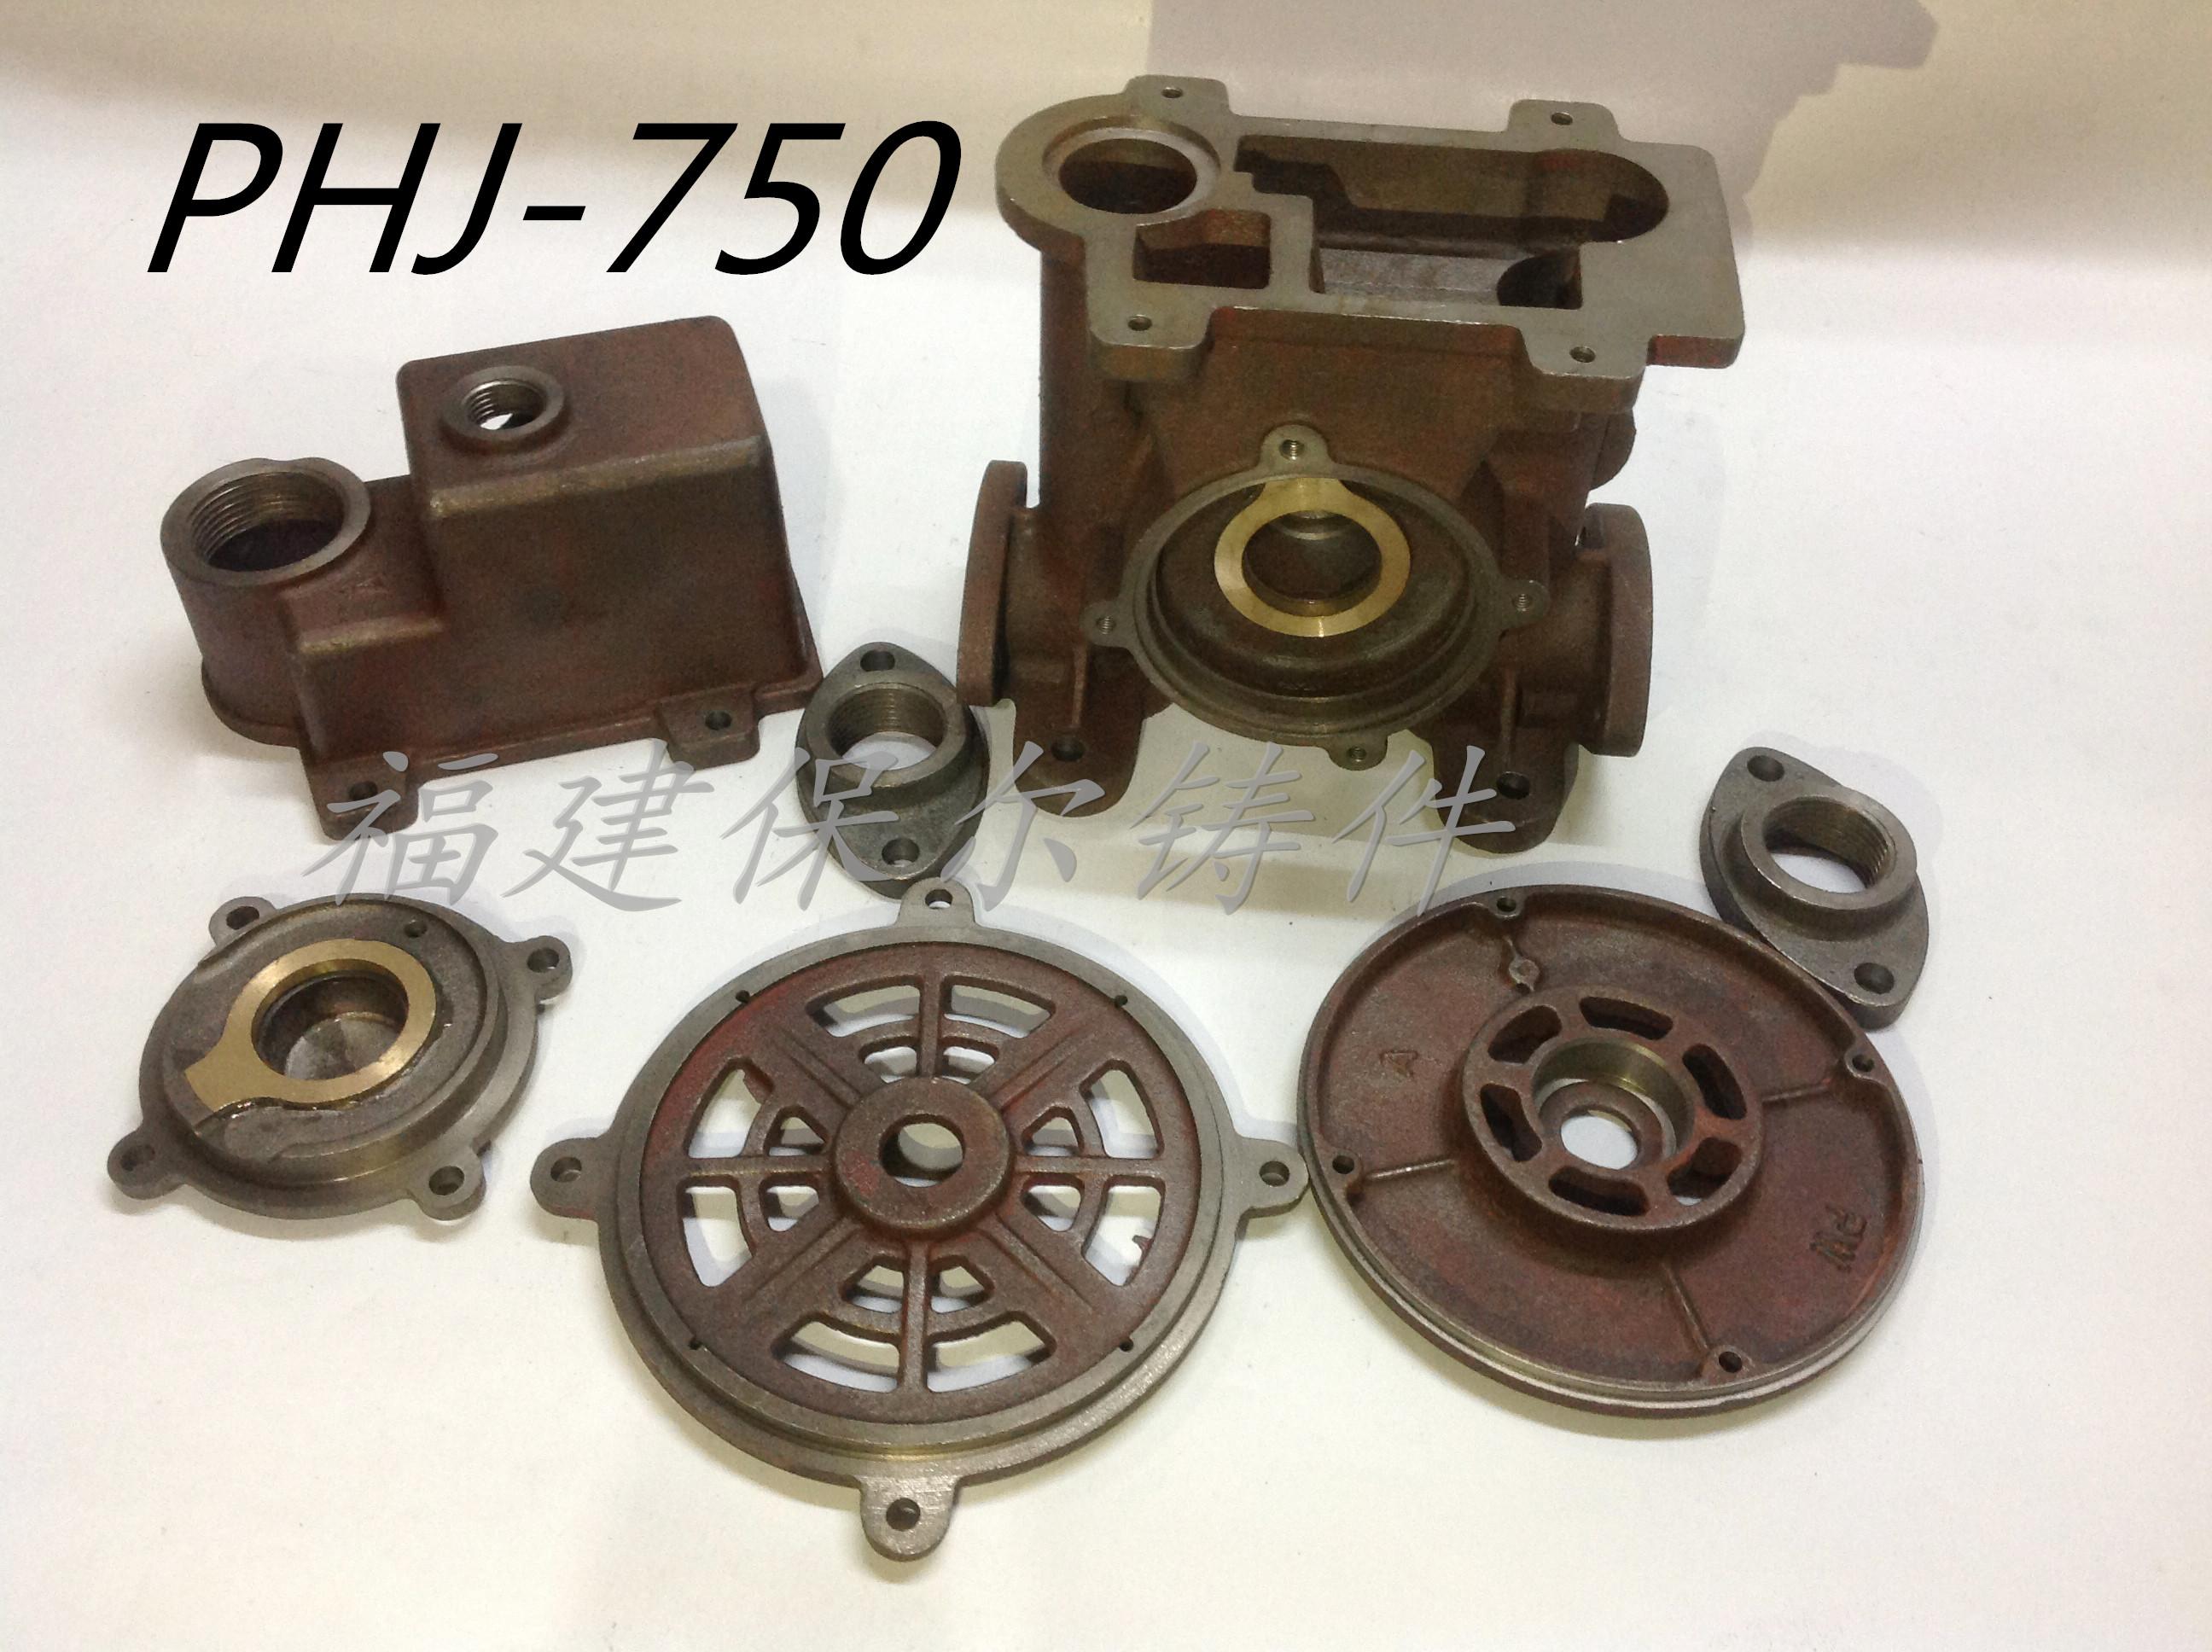 PHJ-750